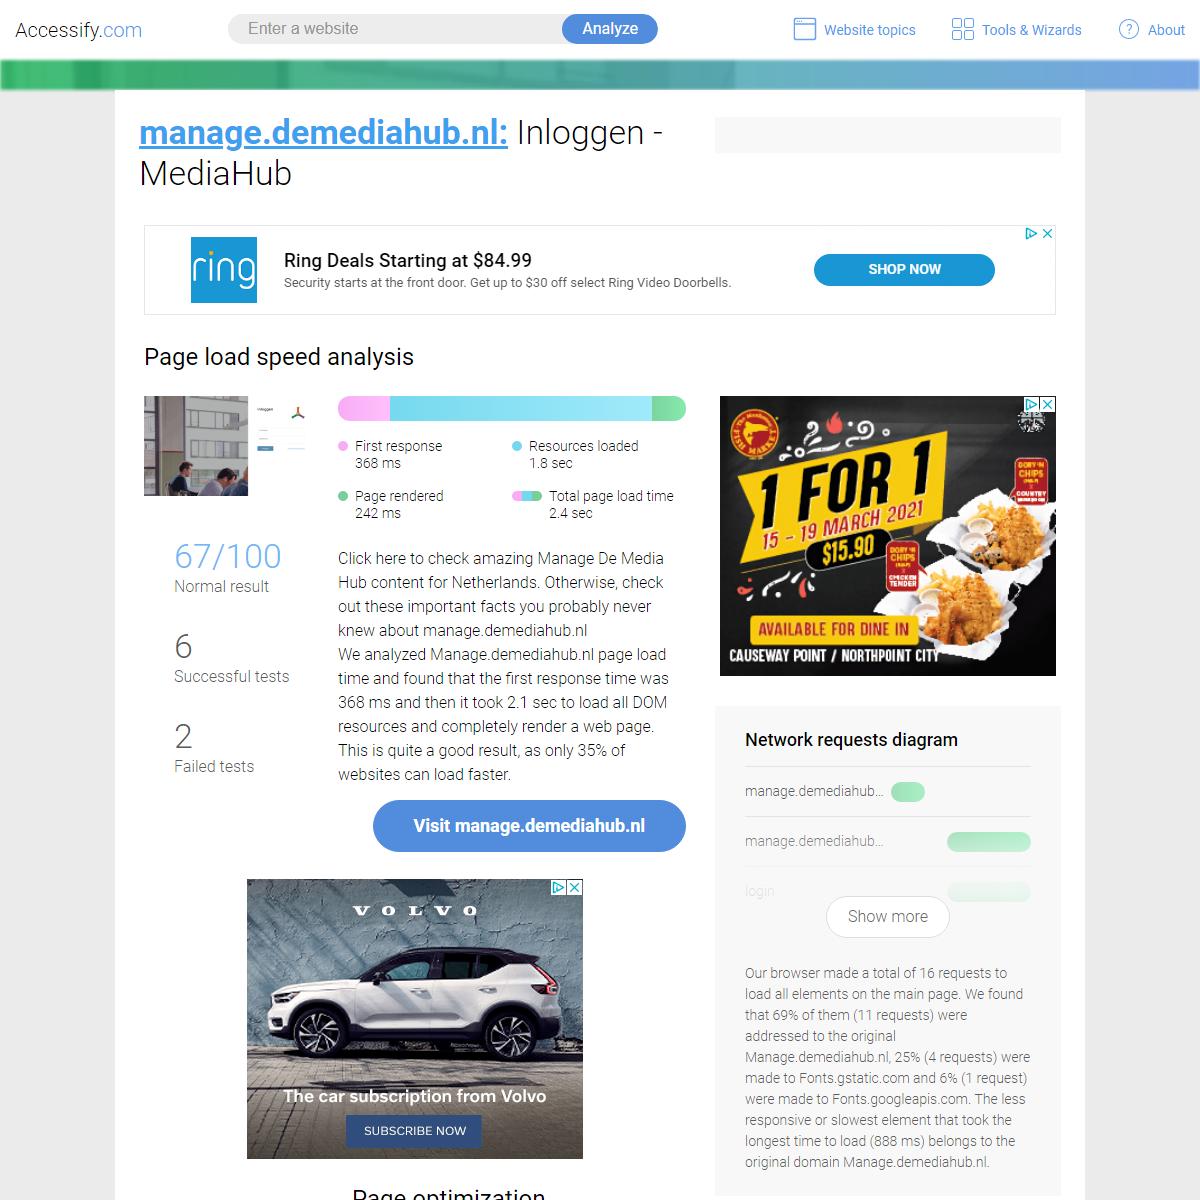 Access manage.demediahub.nl. Inloggen - MediaHub